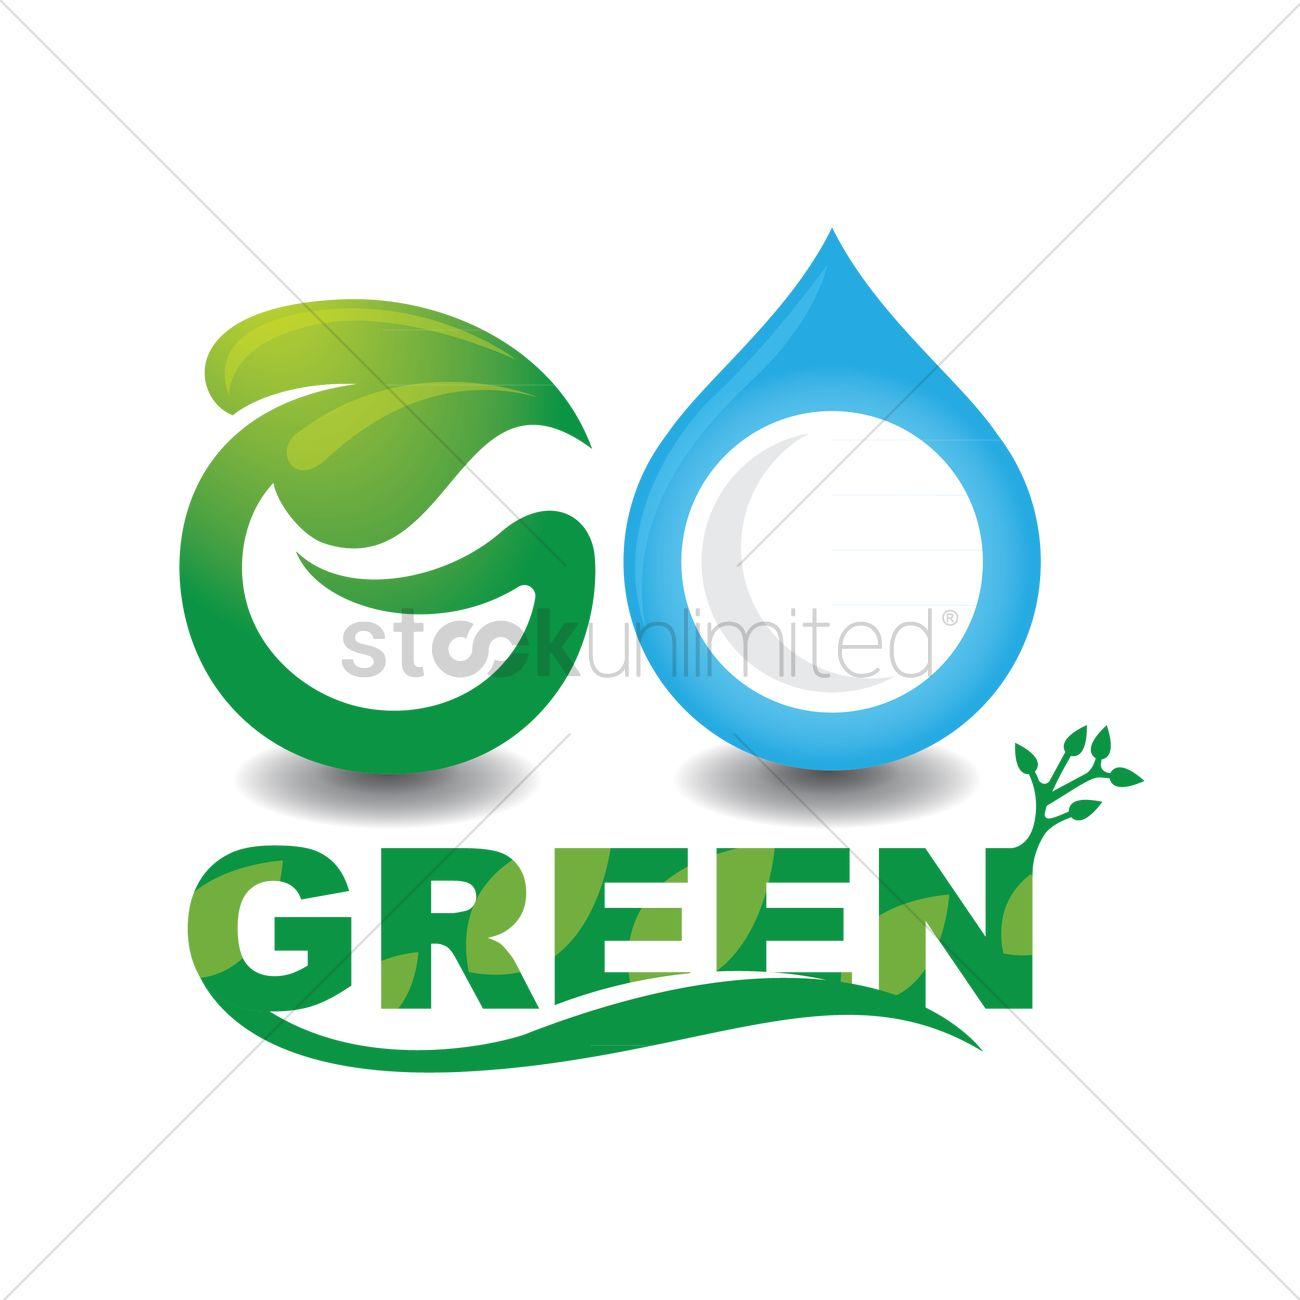 1300x1300 Go Green Lettering Design Vector Image